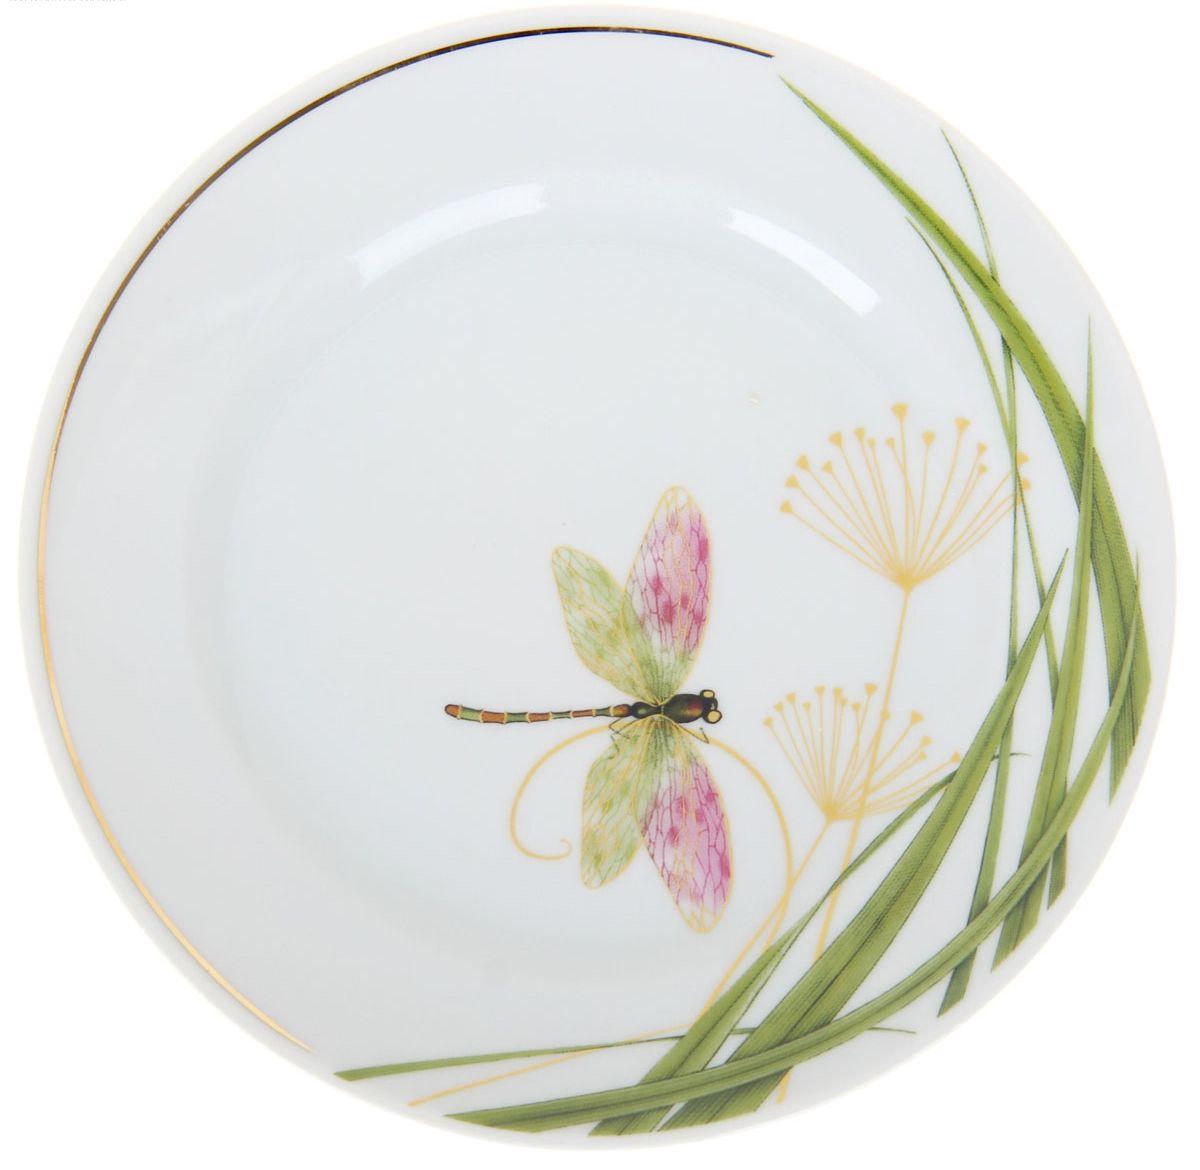 Тарелка мелкая Идиллия. Стрекоза, диаметр 17 см1224521